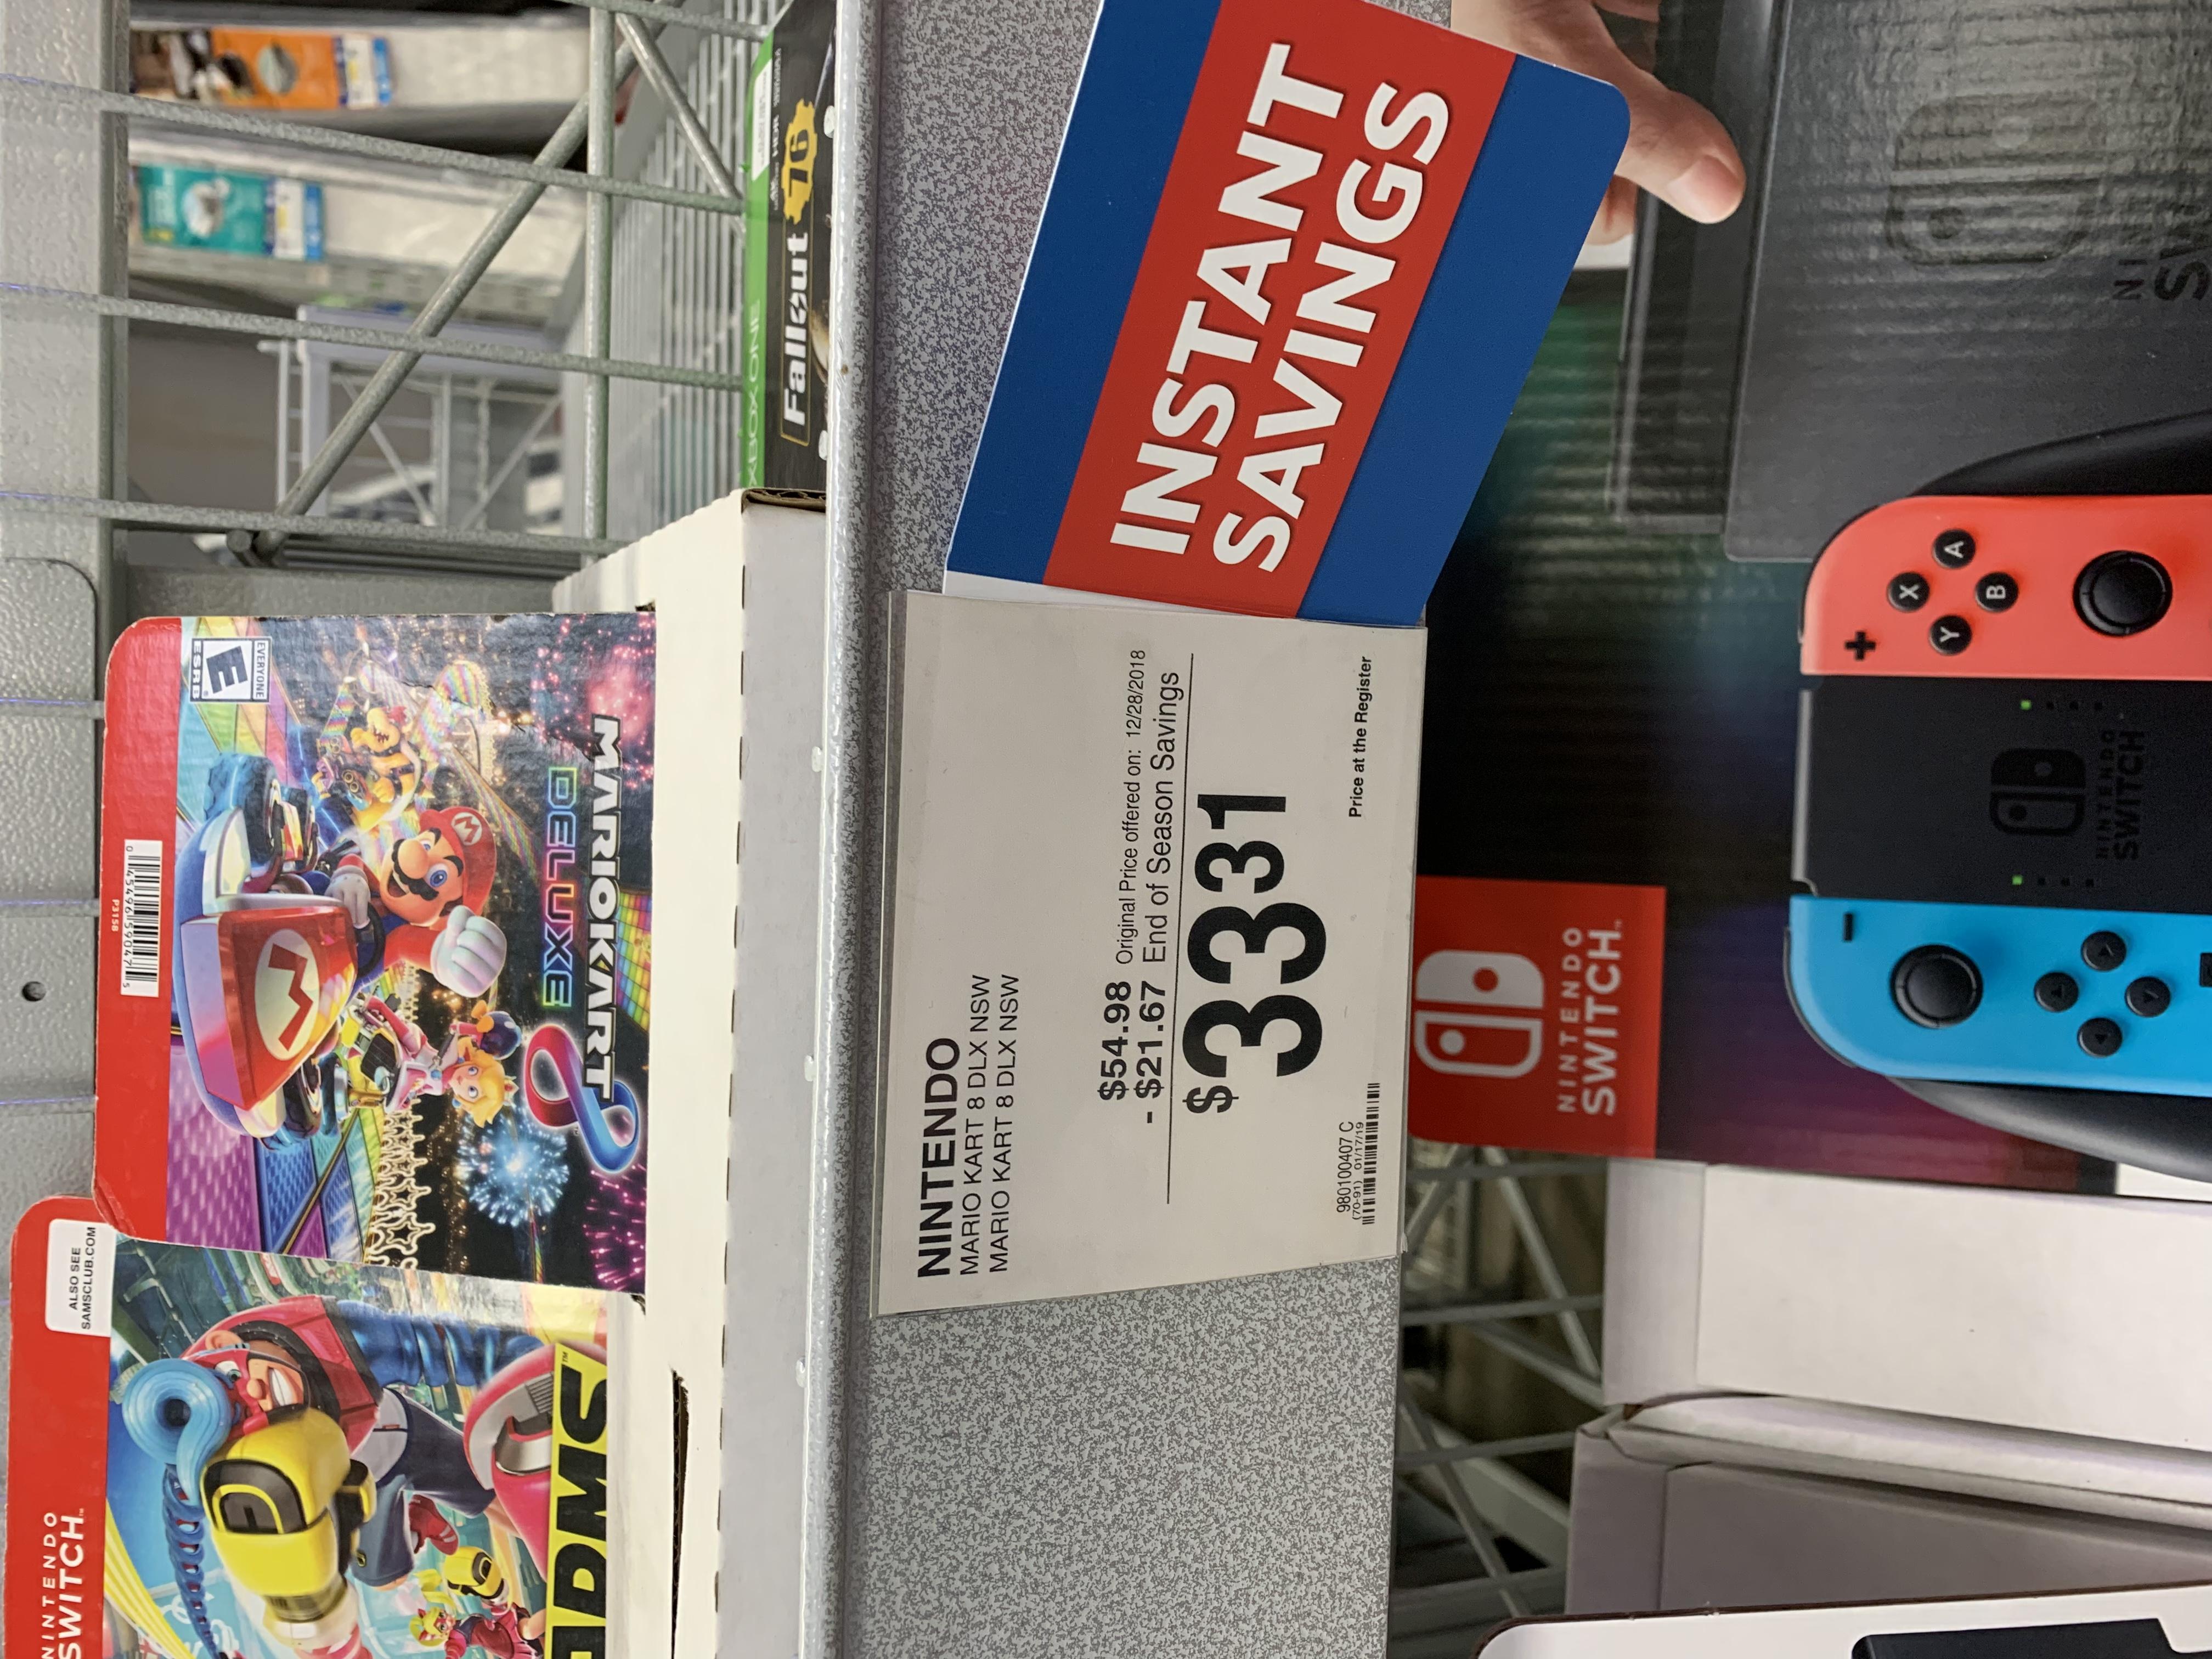 aaacf3a185 Nintendo Switch Mario Kart 8 Deluxe Sam s Club B M YMMV  33.31 -  Slickdeals.net